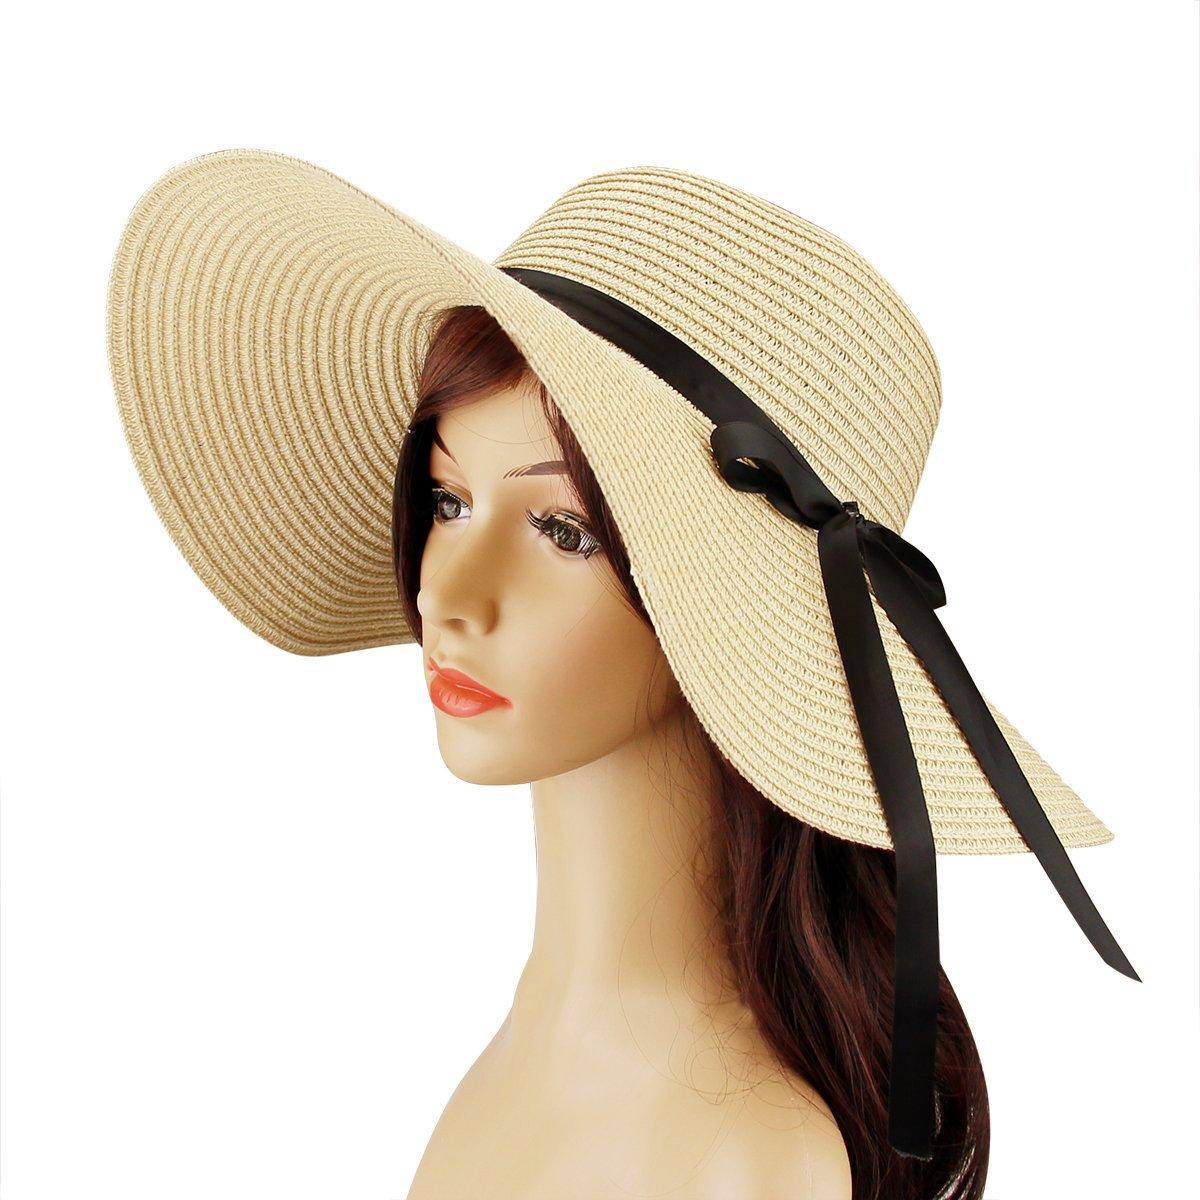 Womens Beach Hat Foldable Summer Cap Big Brim Straw Hat Travel Bowknot Floppy Sun Hat Beige